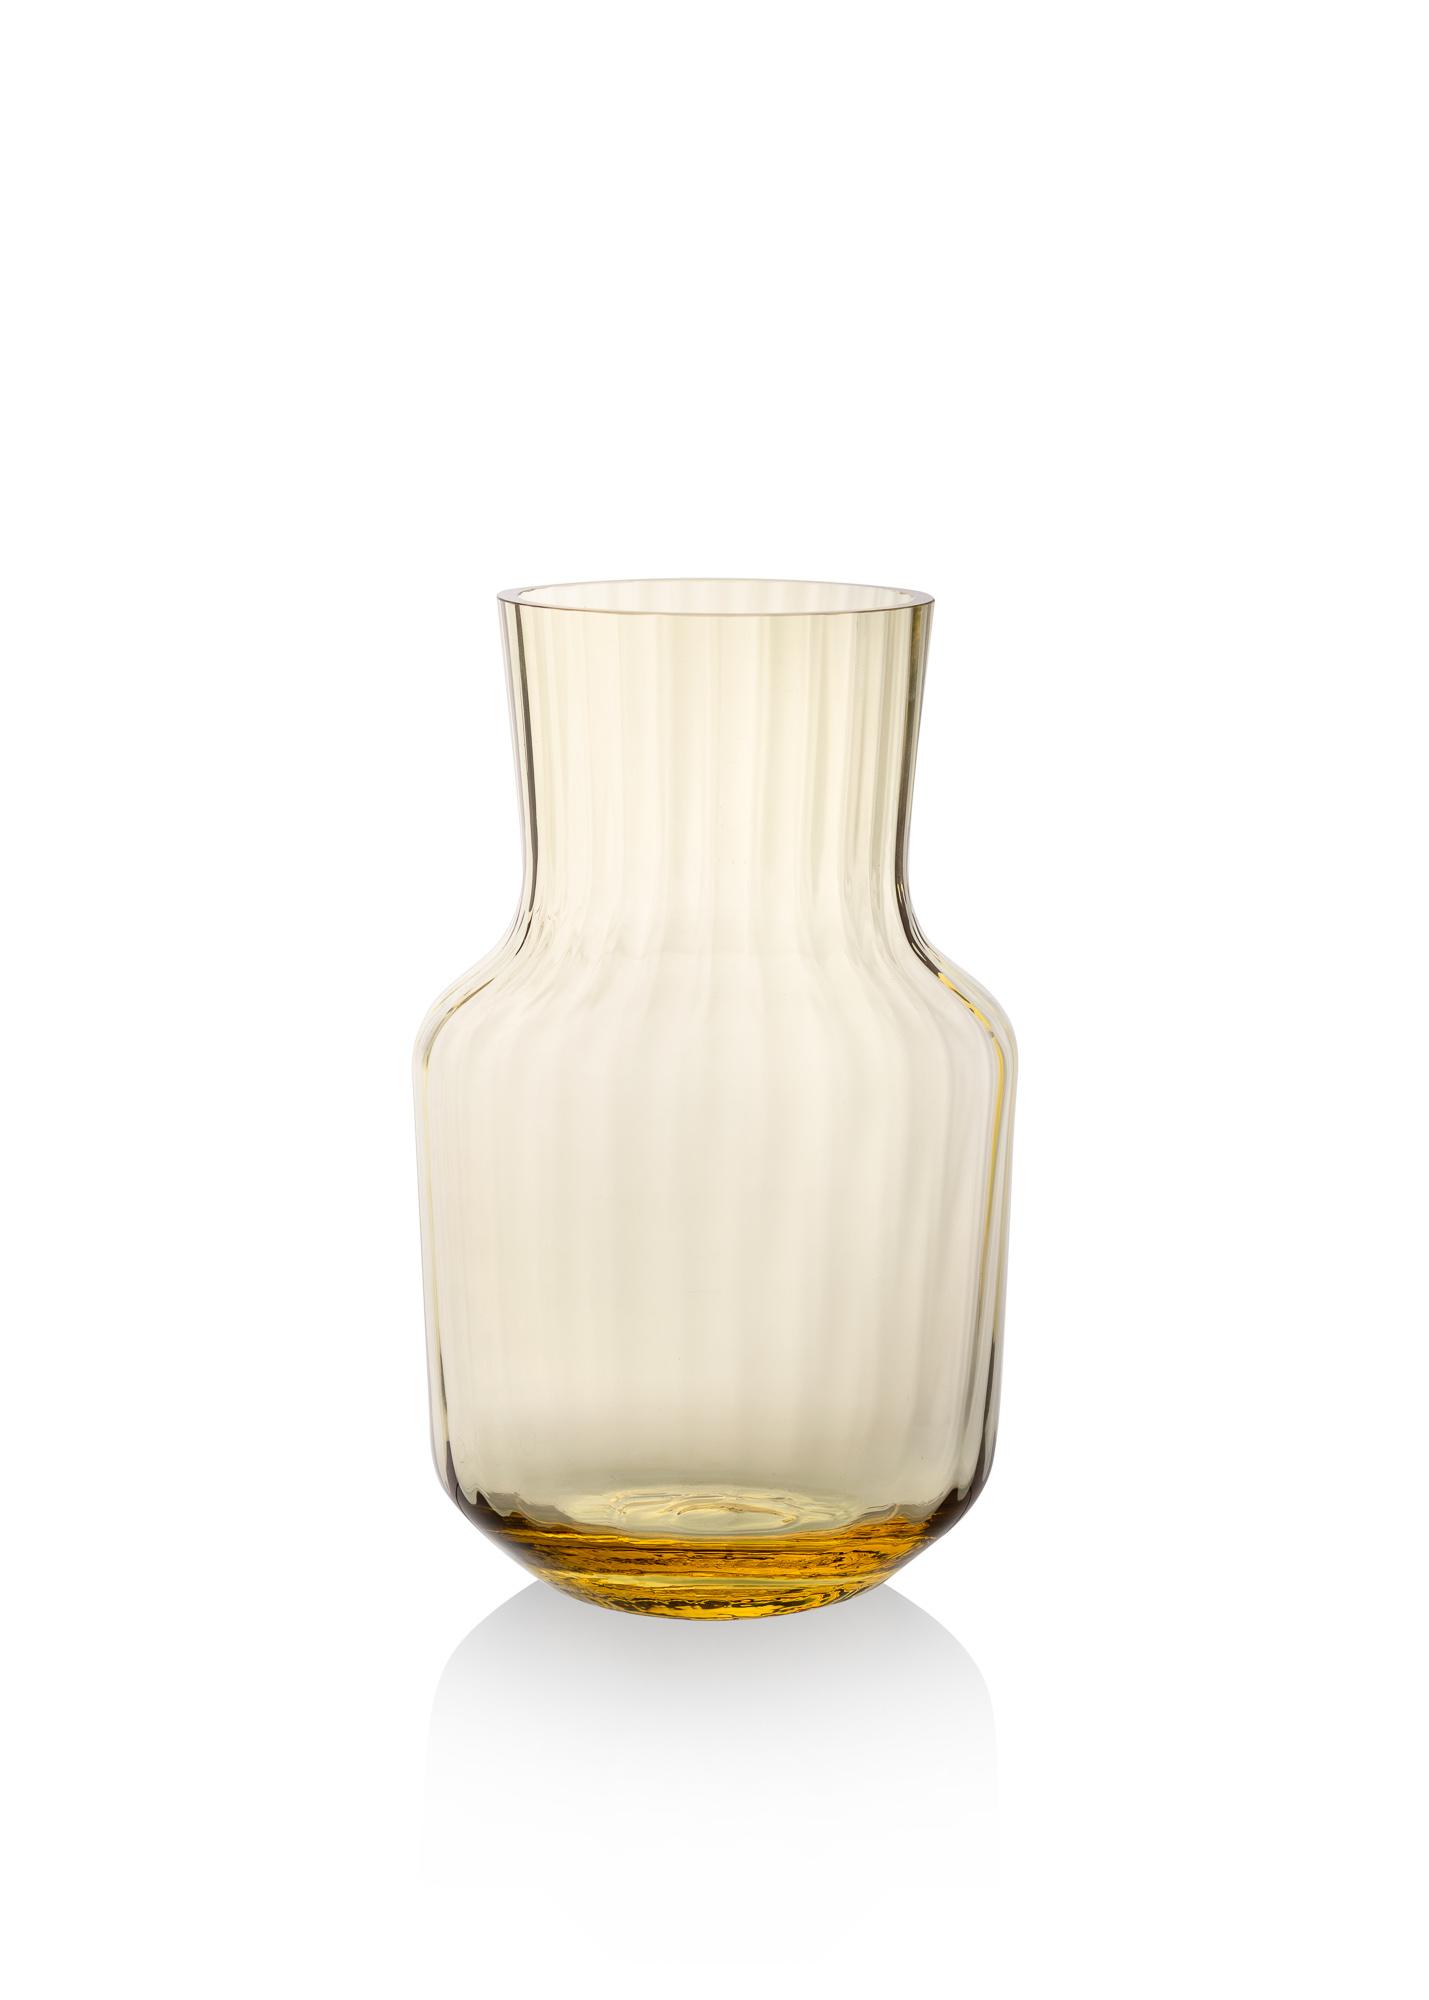 Sklenéná váza Lukáš Jabůrek